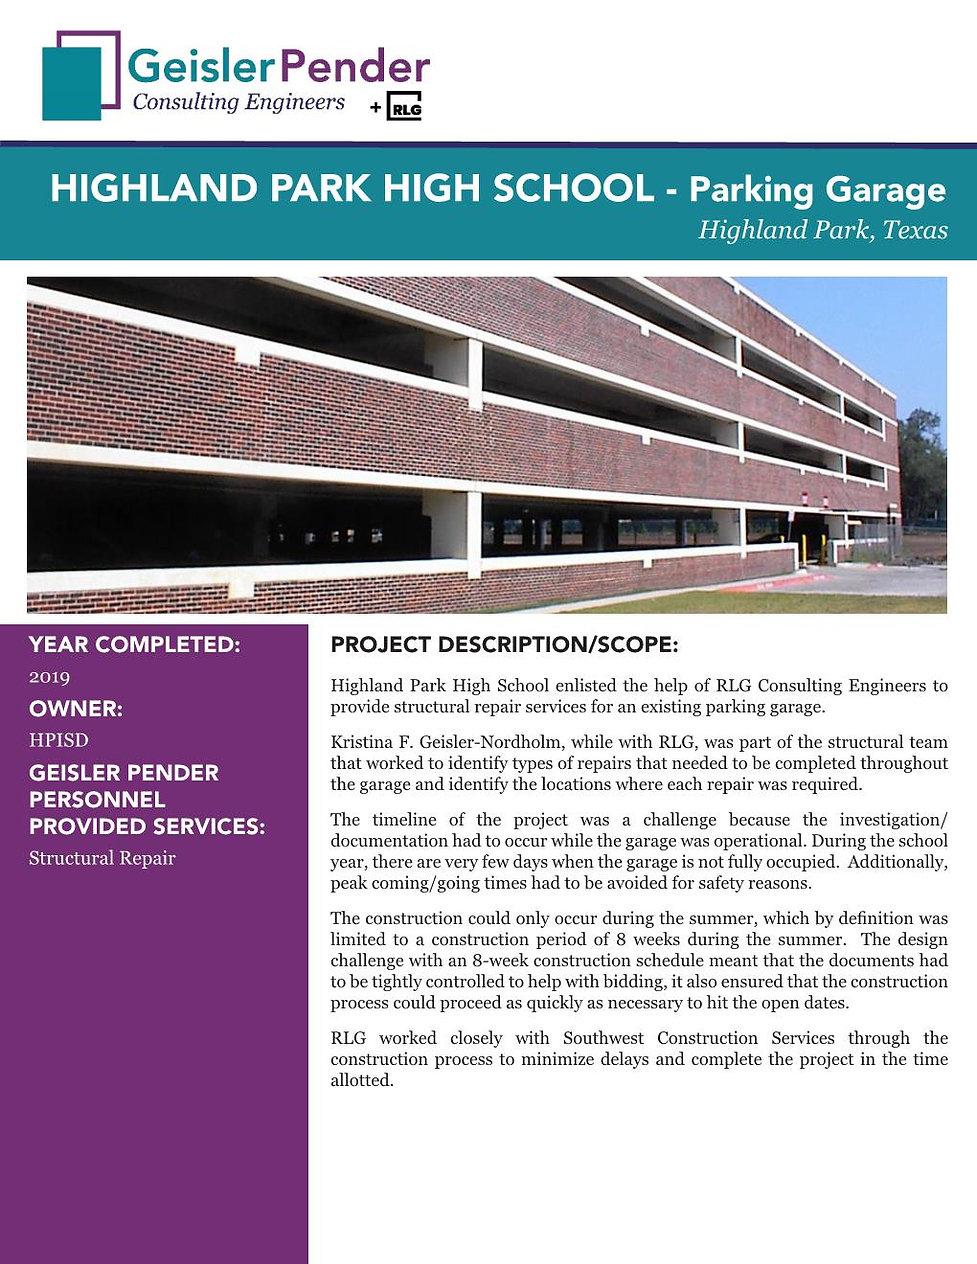 HPHS-Parking Garage.jpg